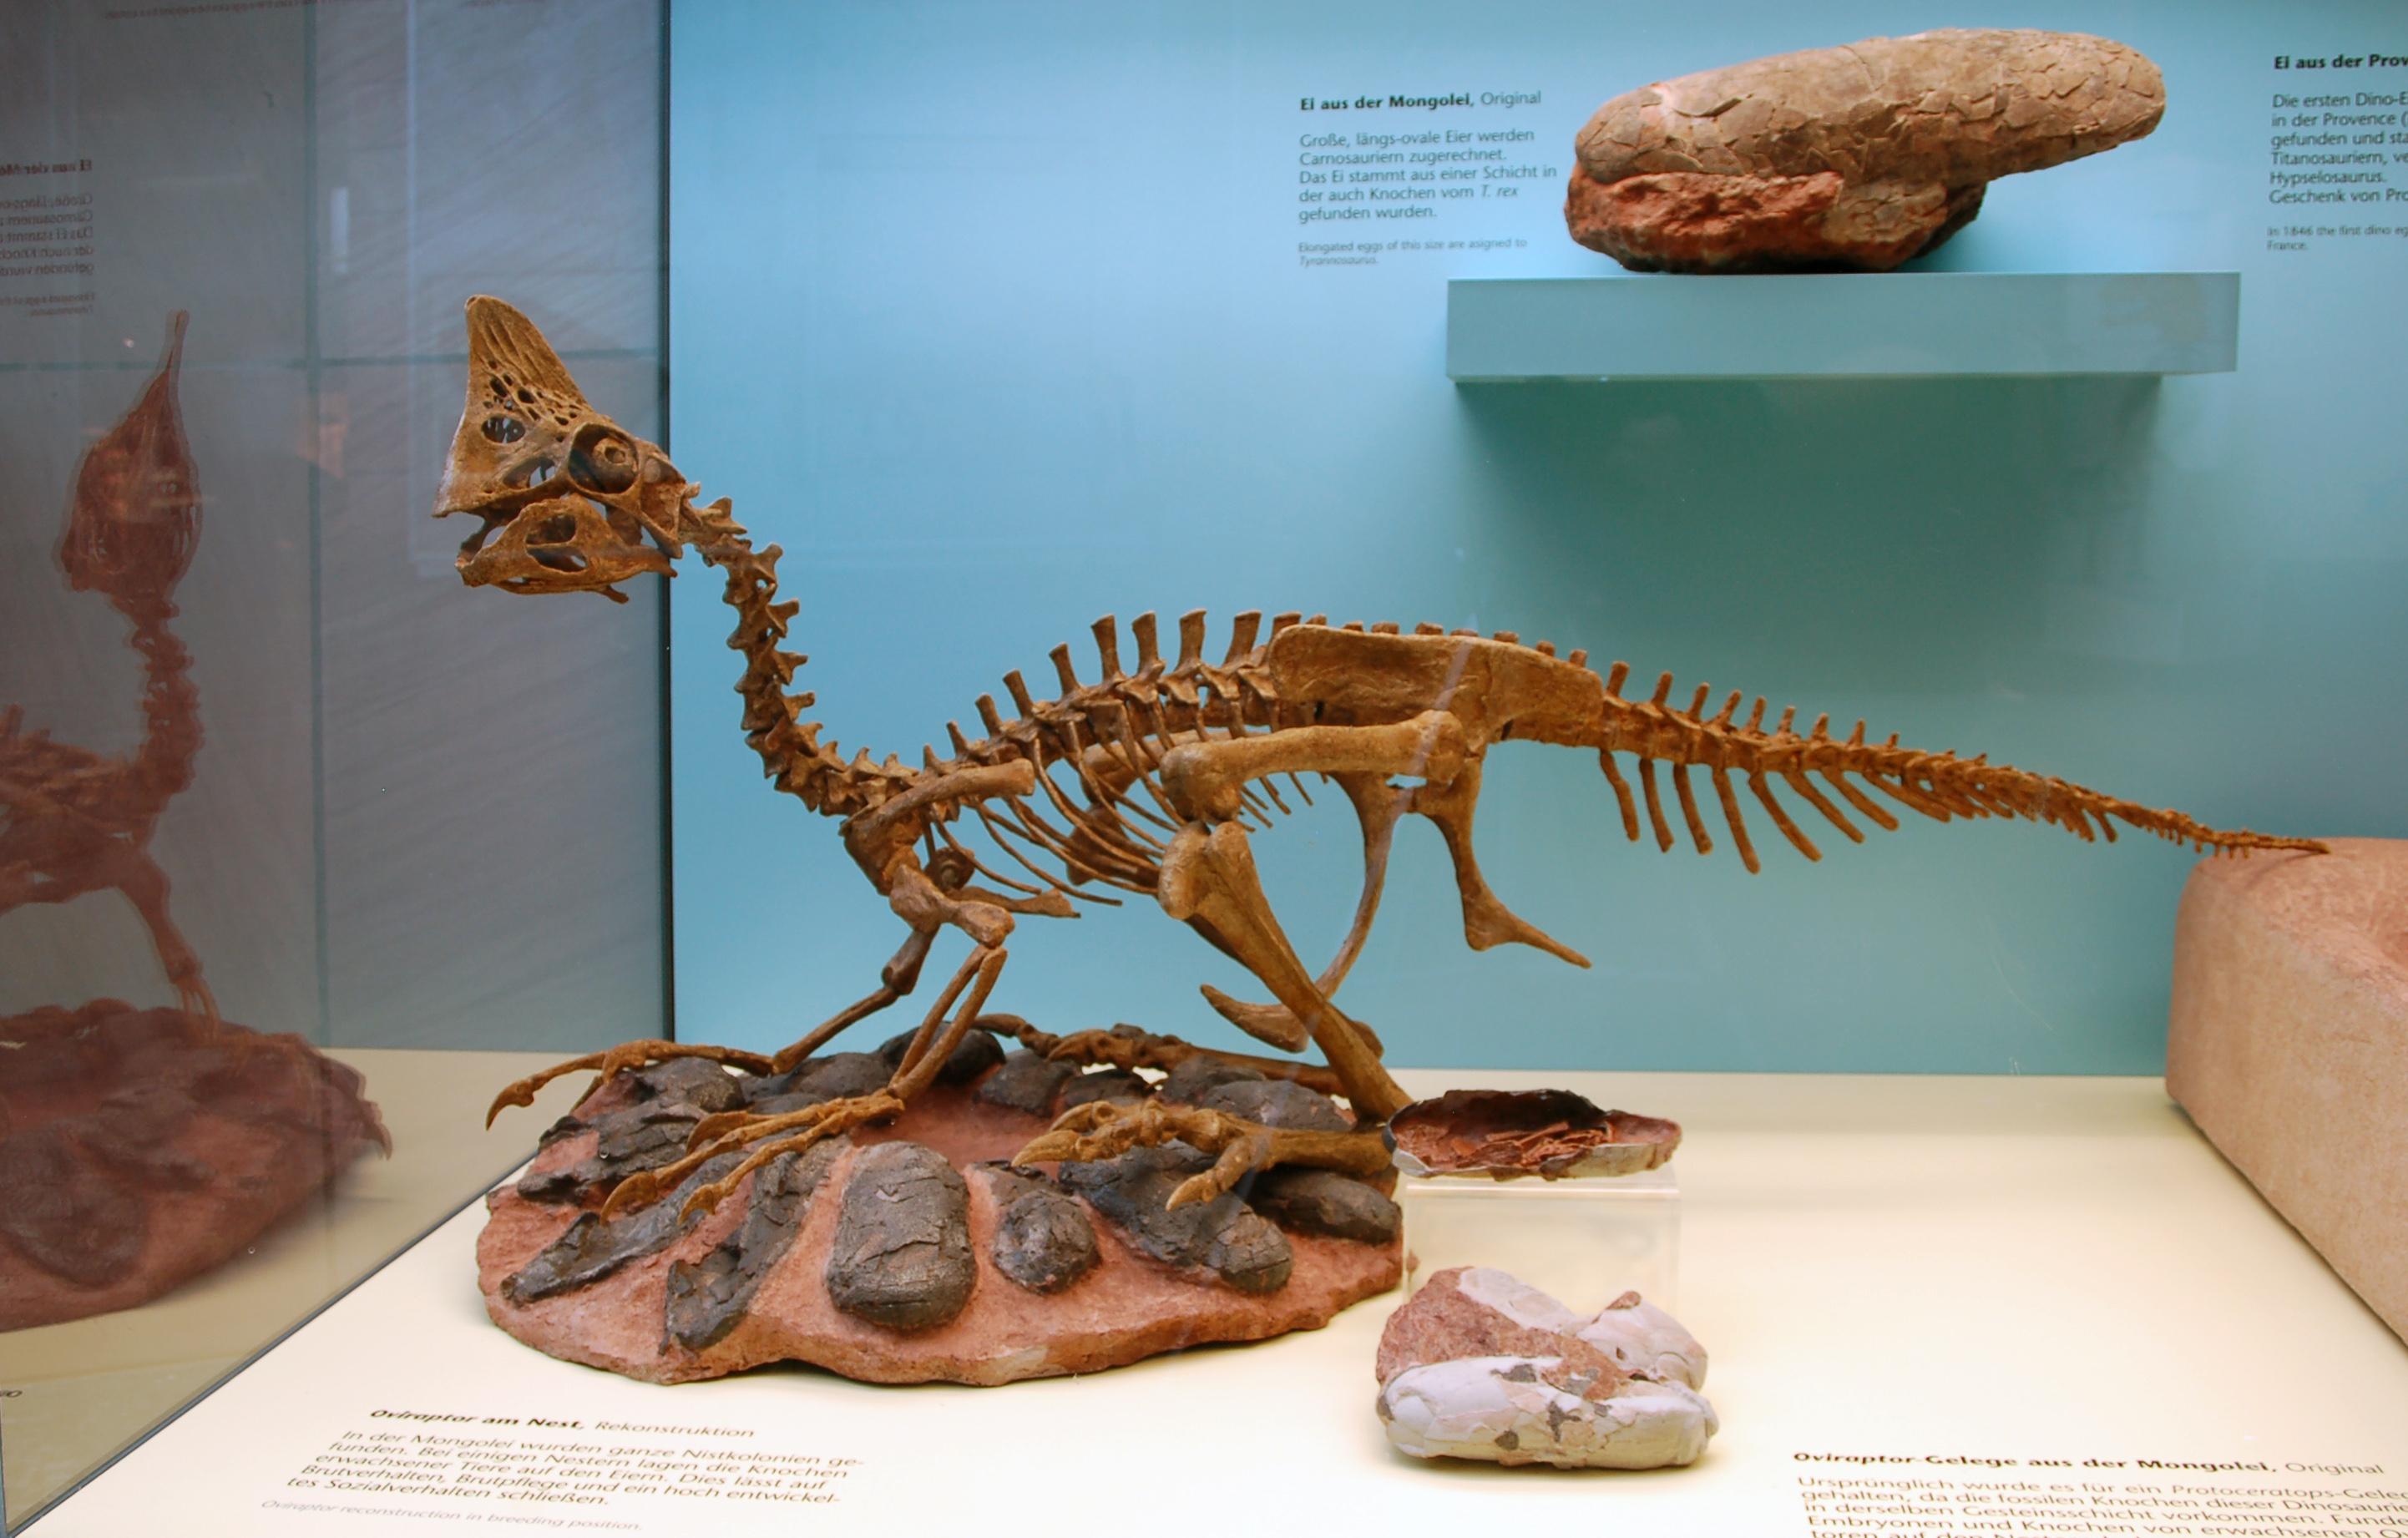 http://upload.wikimedia.org/wikipedia/commons/f/fa/Oviraptor_Senckenberg.jpg